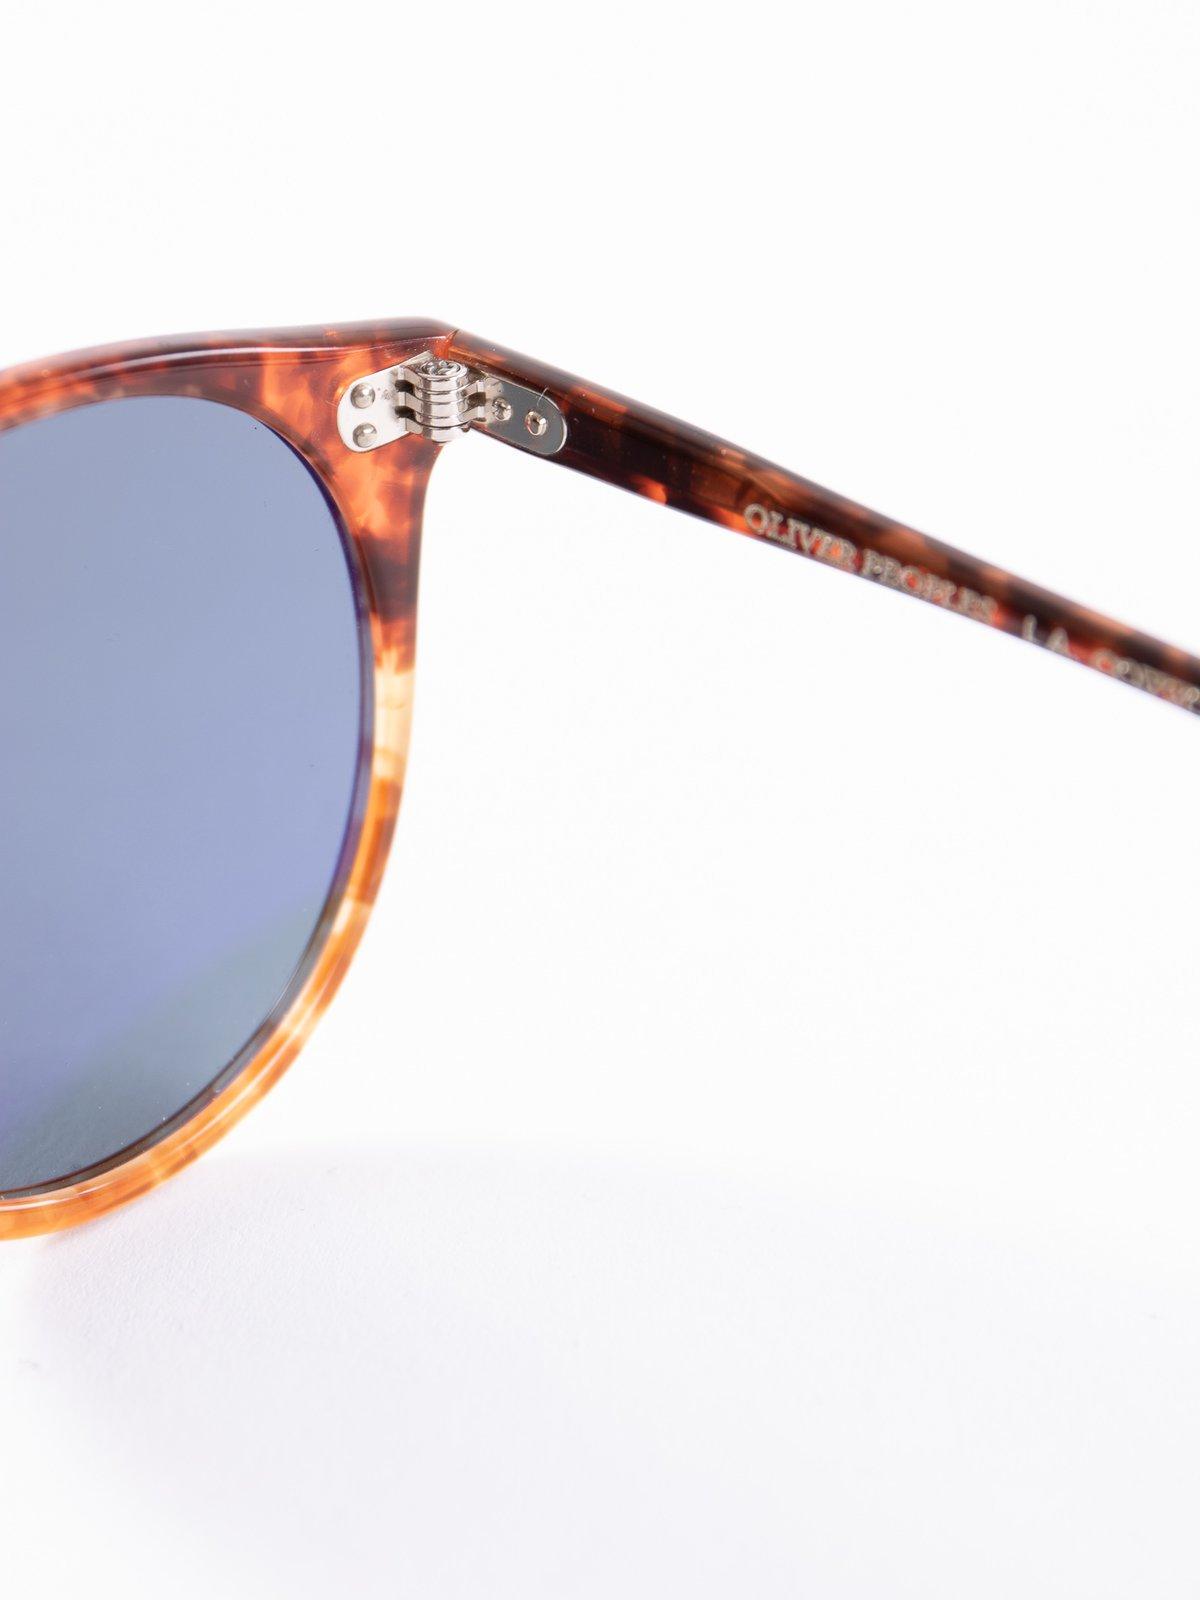 Vintage 1282/Blue Photochromic O'Malley Sunglasses - Image 4